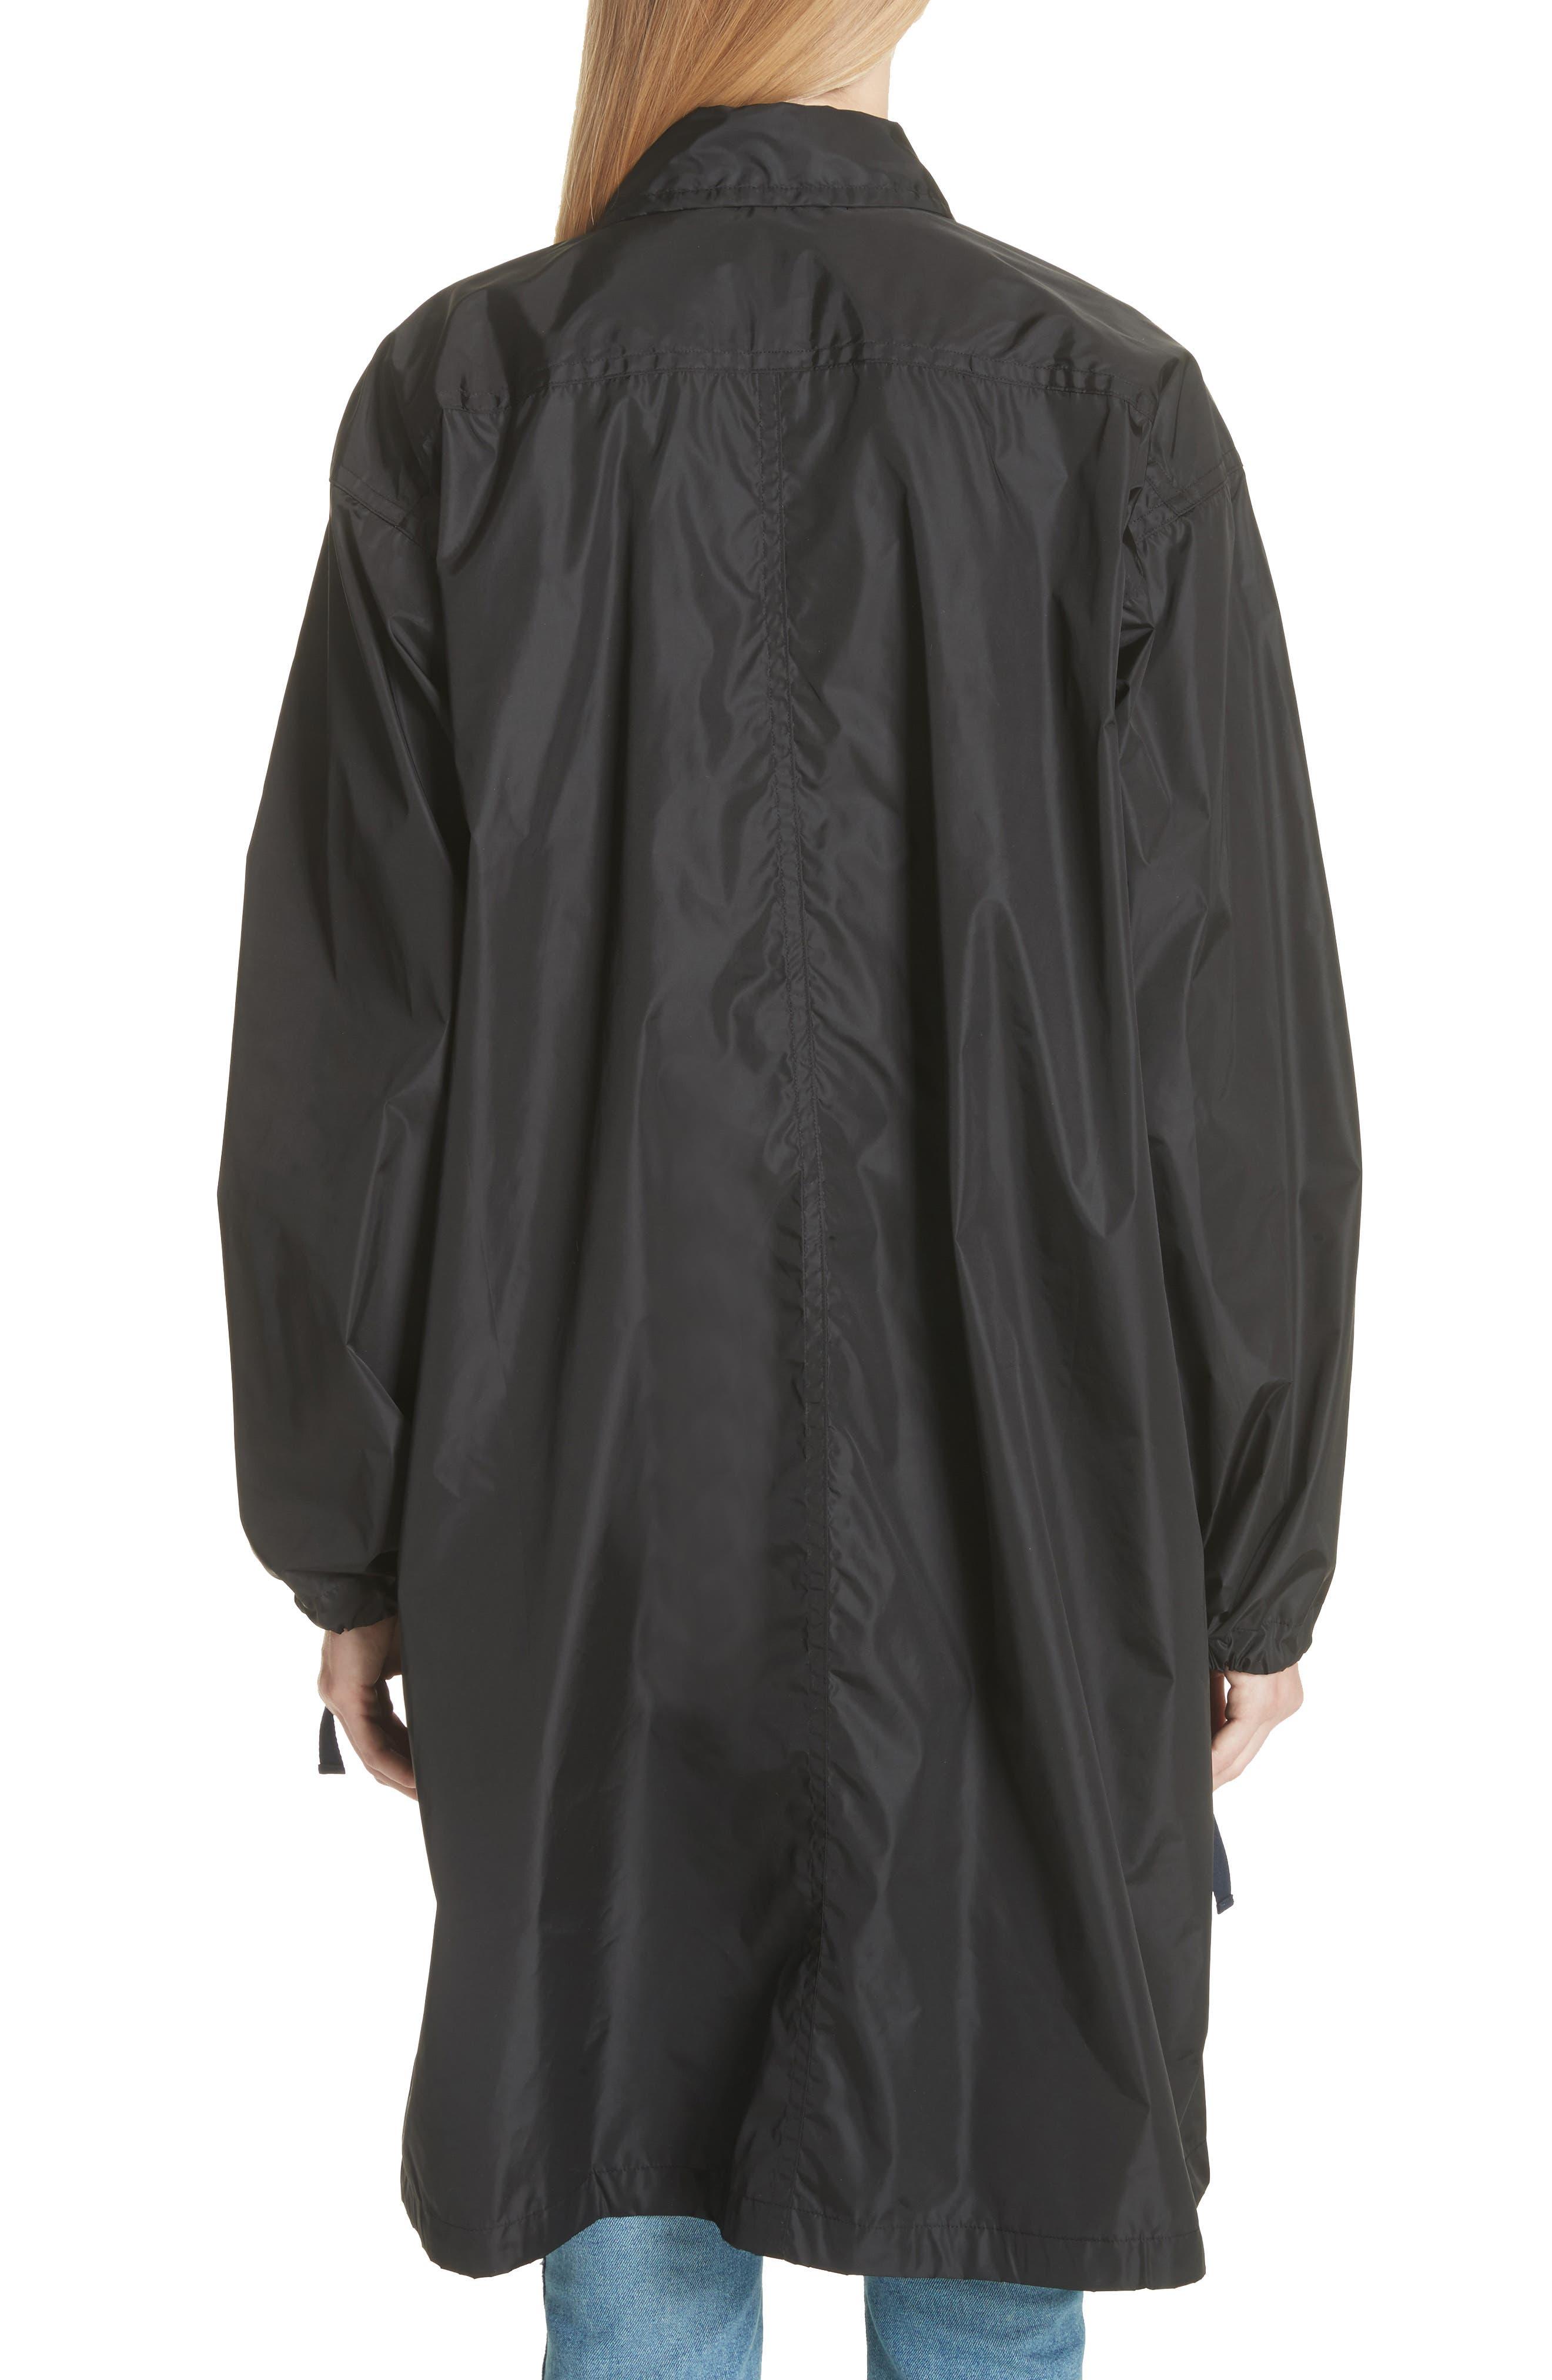 Raincoat with Inside Suspenders,                             Alternate thumbnail 3, color,                             Black